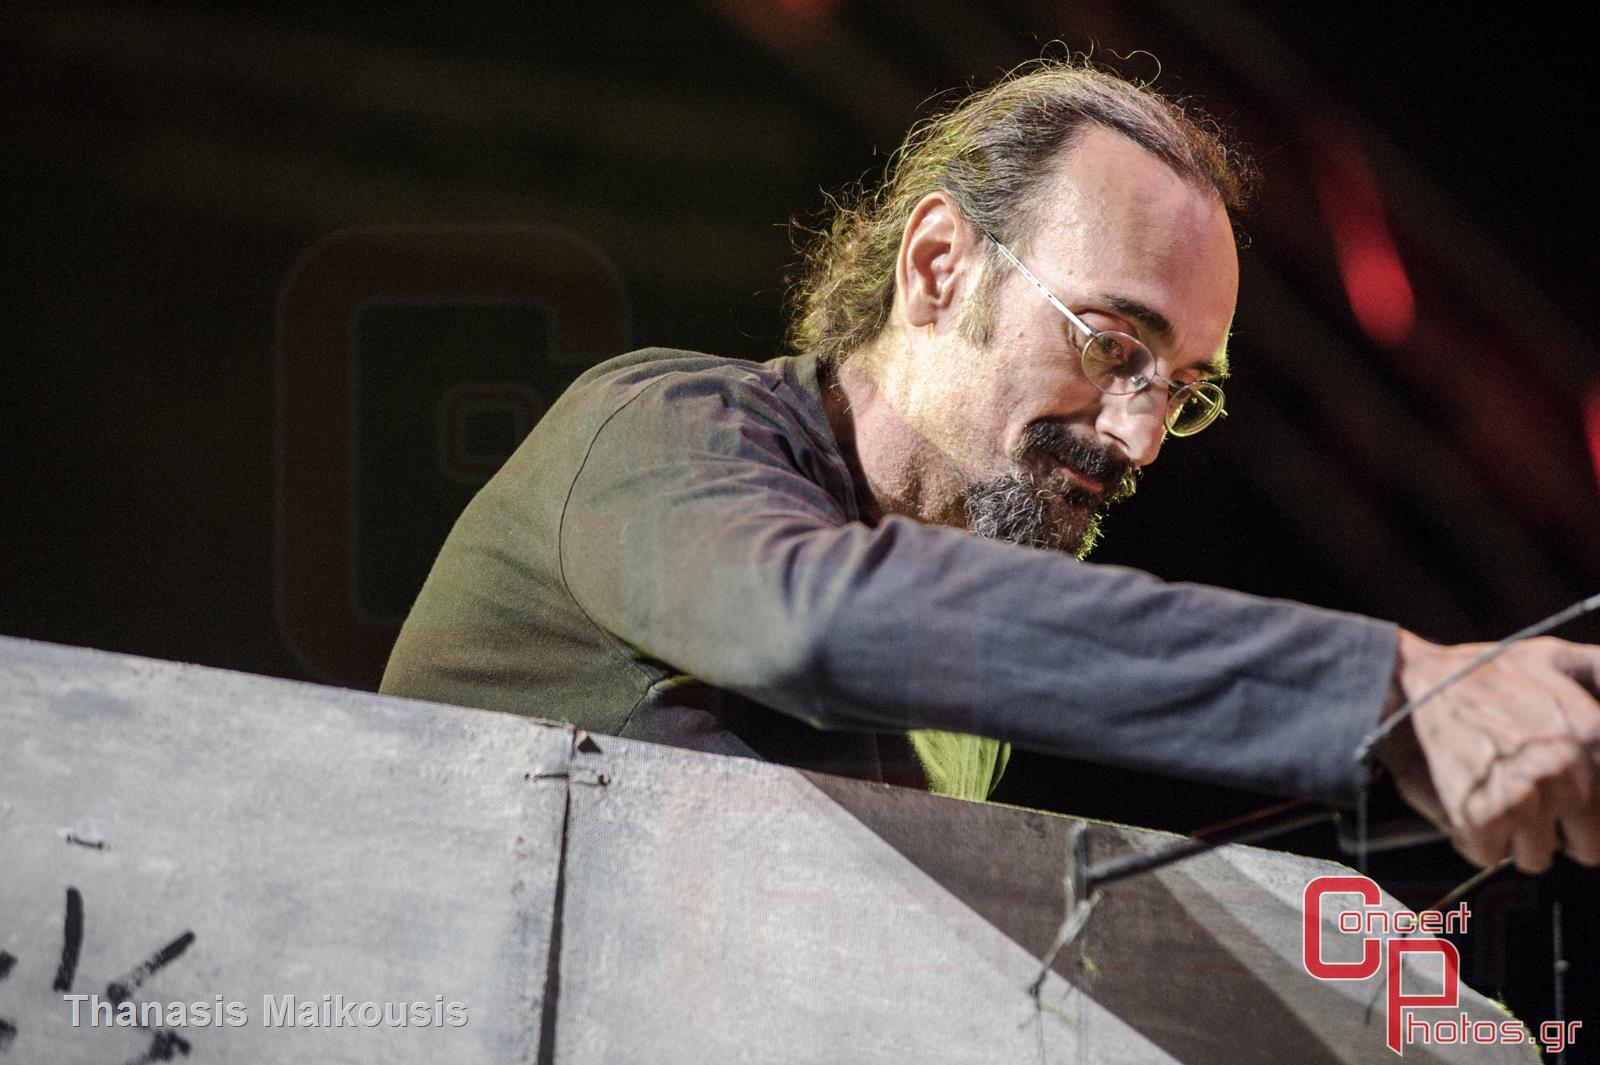 Active Member - Τραγούδα μας να φύγει το σκοτάδι- photographer: Thanasis Maikousis - concertphotos_-5061